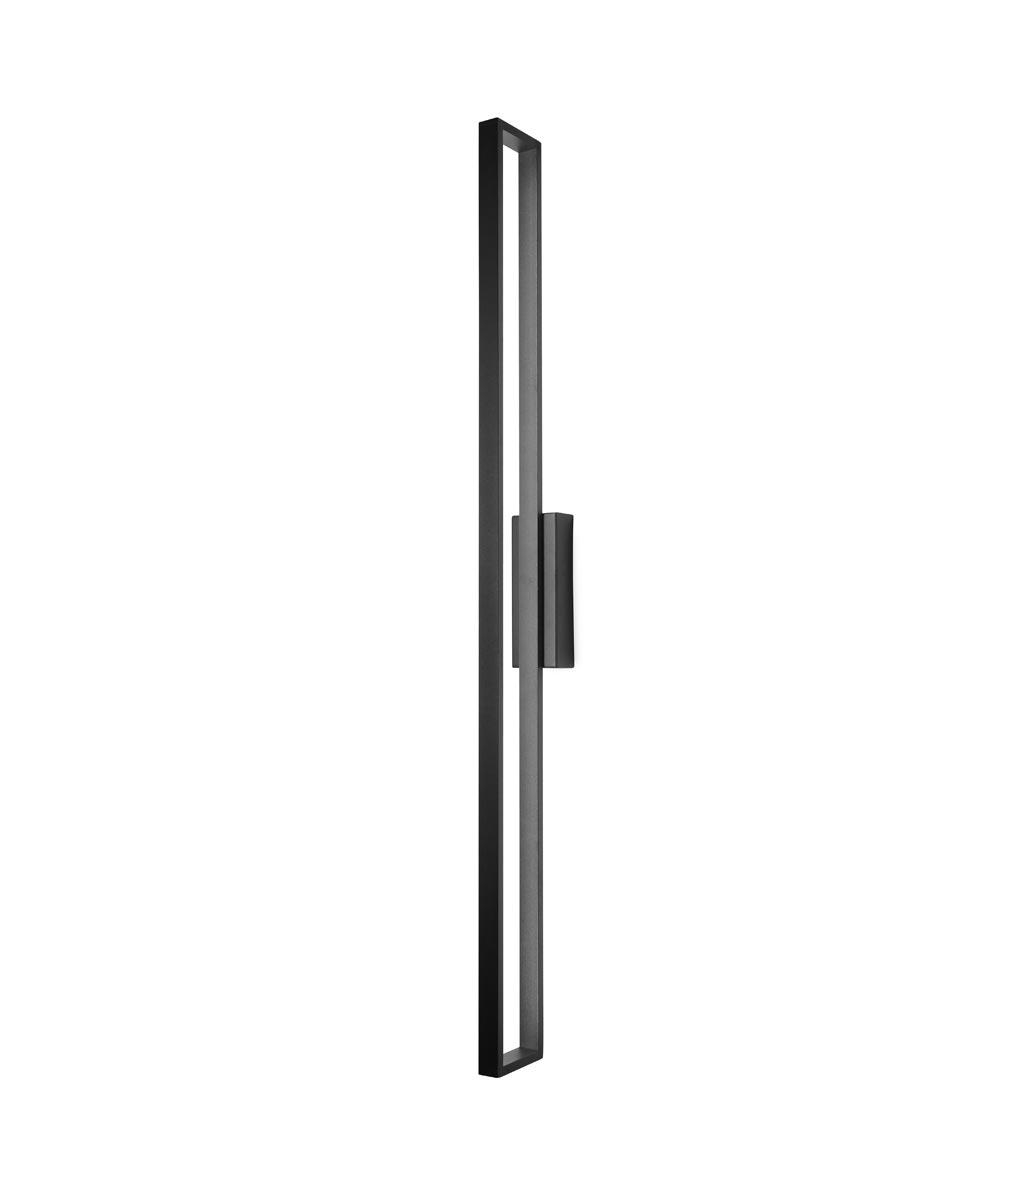 Lámpara aplique negro minimalista 30W DURBAN LED